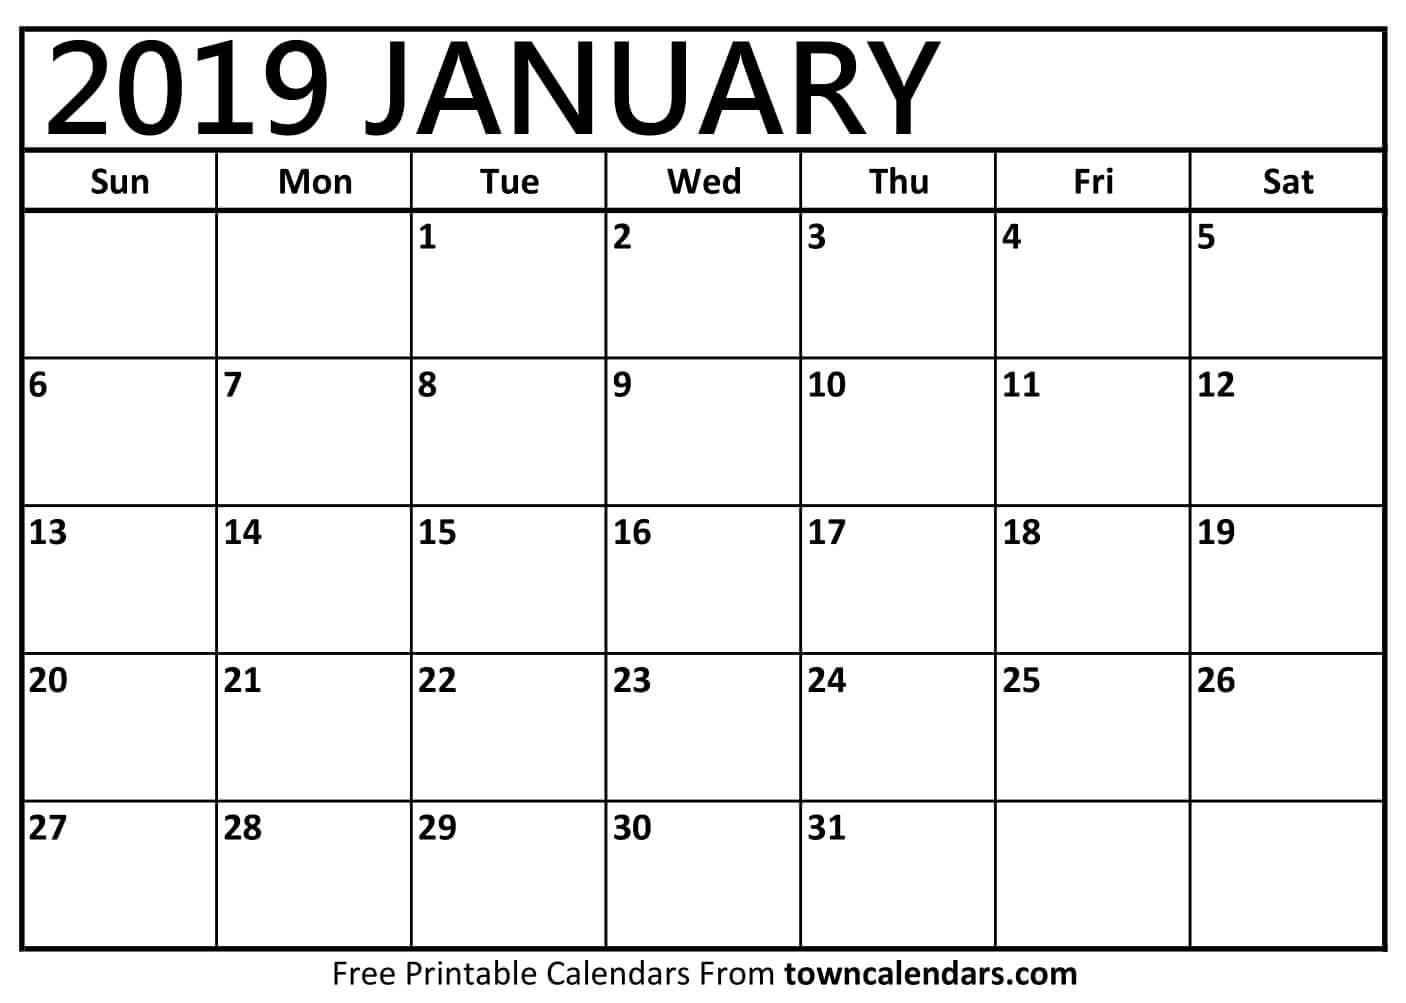 January 2019 Printable Calendar Pdf Free Monthly Template Calendar 2019 January Template